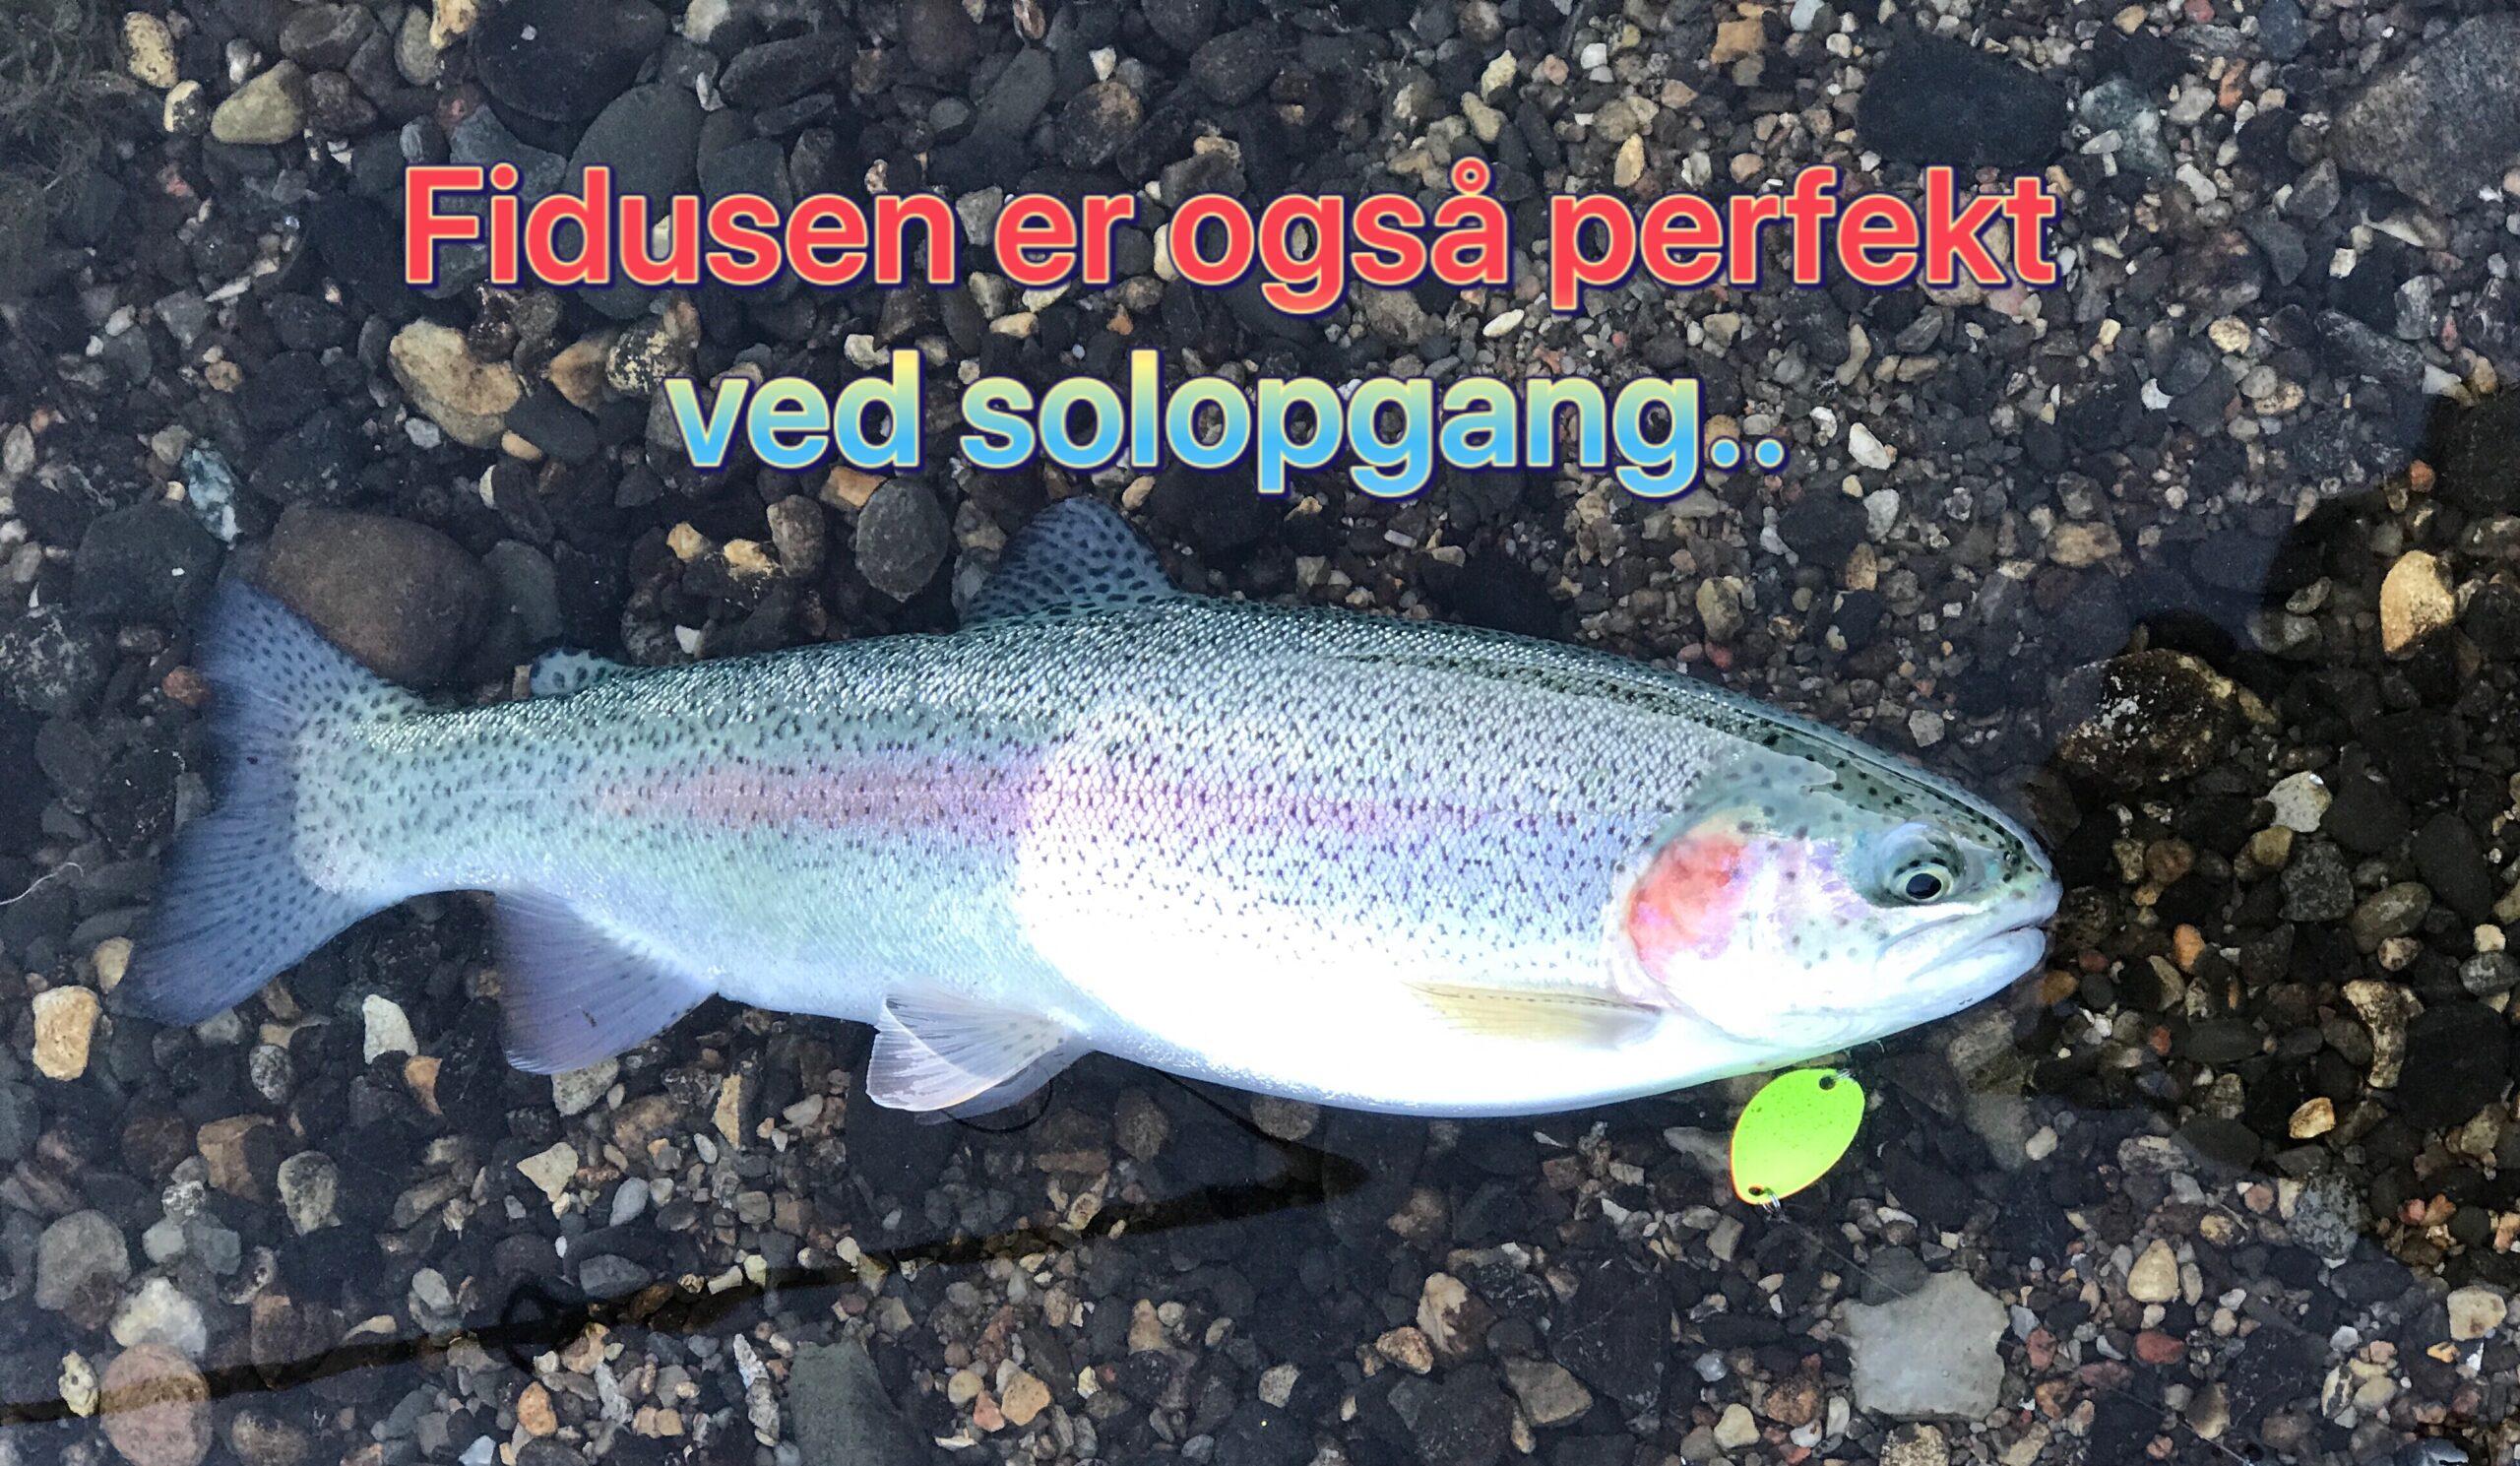 SE VIDEO – Mjøls Lystfiskeri – hug på Fidusen ved solopgang